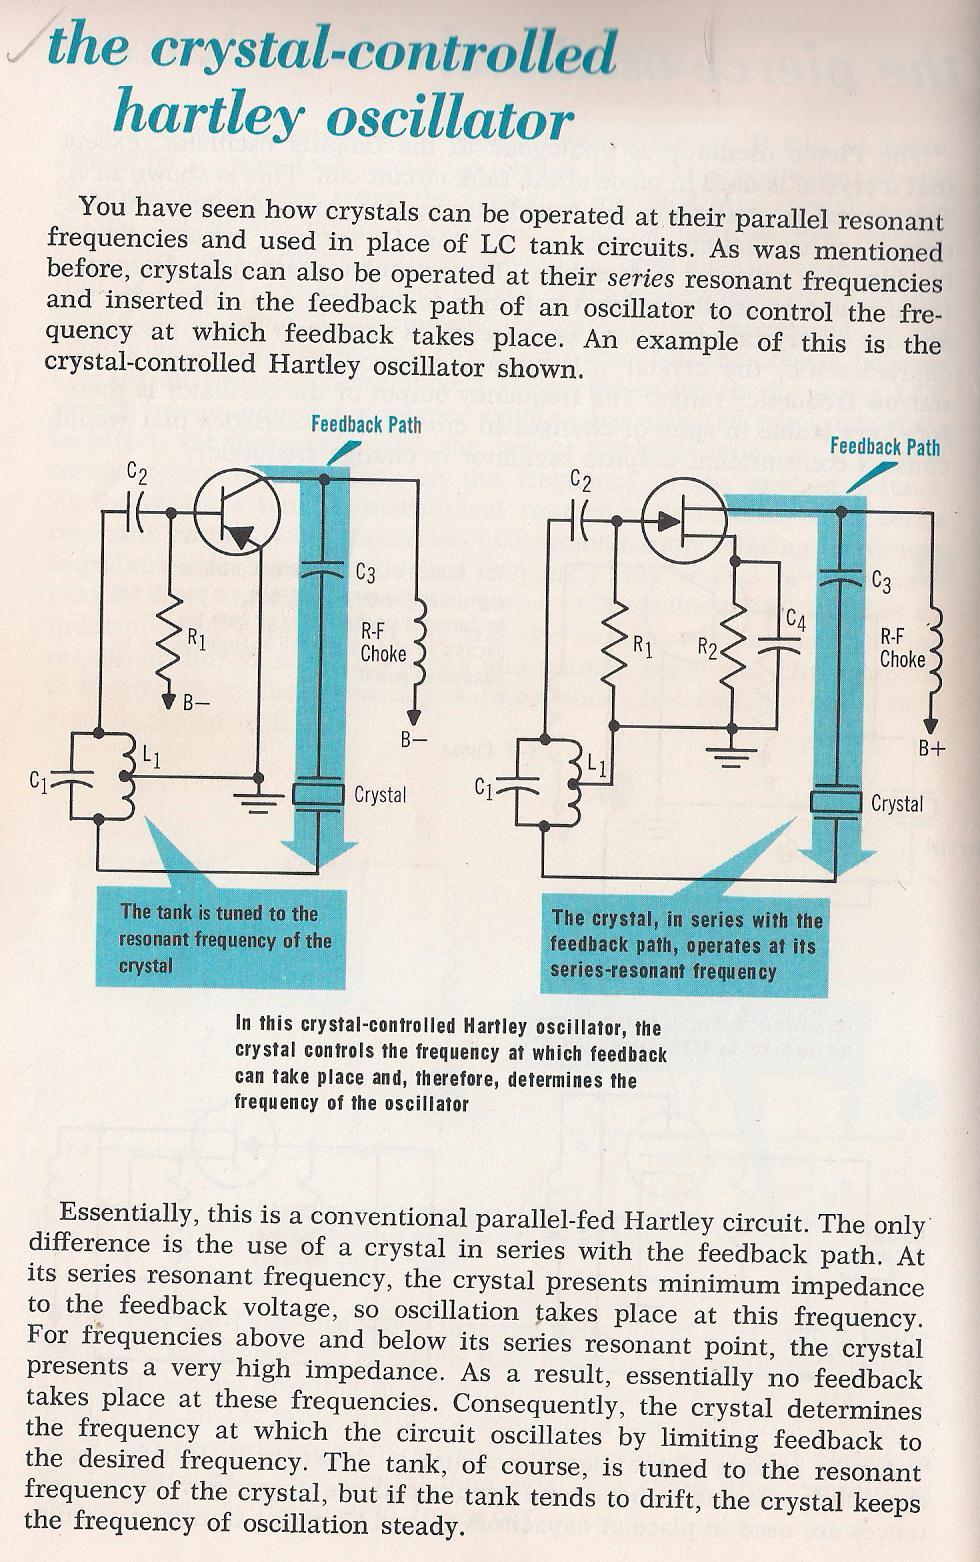 Oscillators Crystal Oscillator Circuits 025 Resonant Frequency Larry E Gugle K4rfe 026 Equivalent Circuit